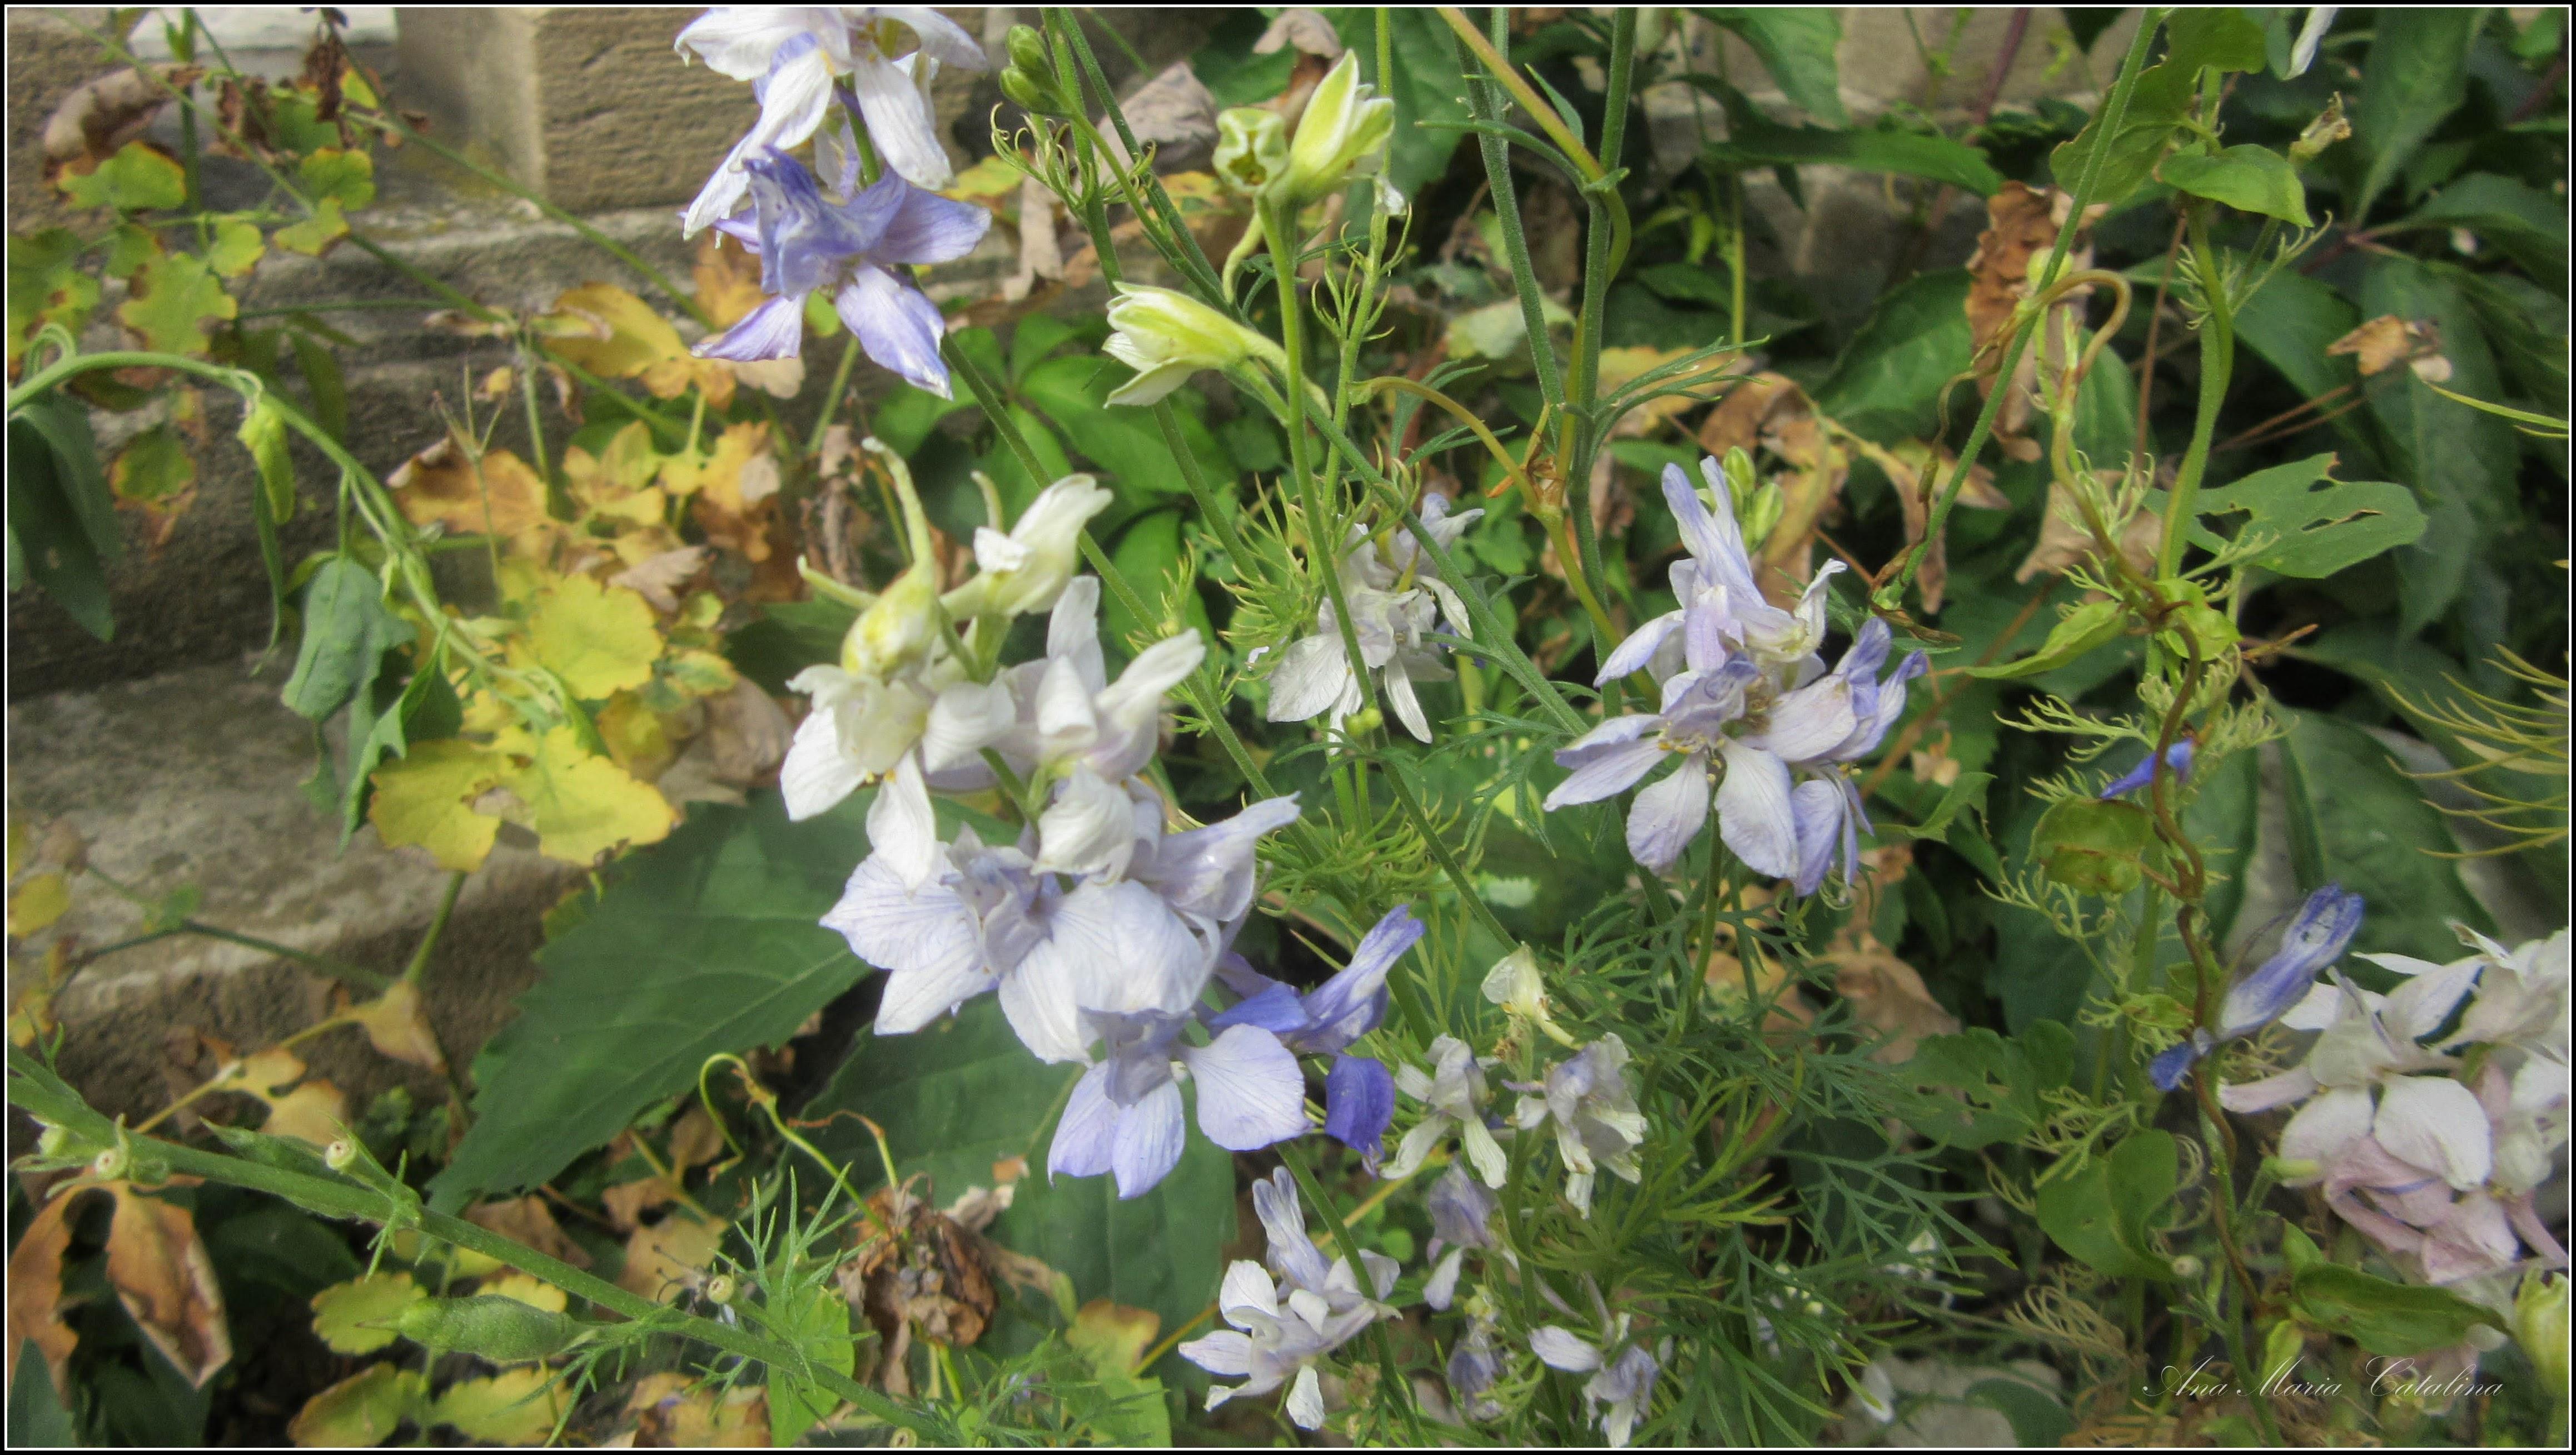 Photo: Rozmarin ( Rozmarinus officinalis) - din Cimitirul Crestin Central -  2017.07.05 album div. http://ana-maria-catalina.blogspot.ro/2017/05/plante-diverse-din-comert.html